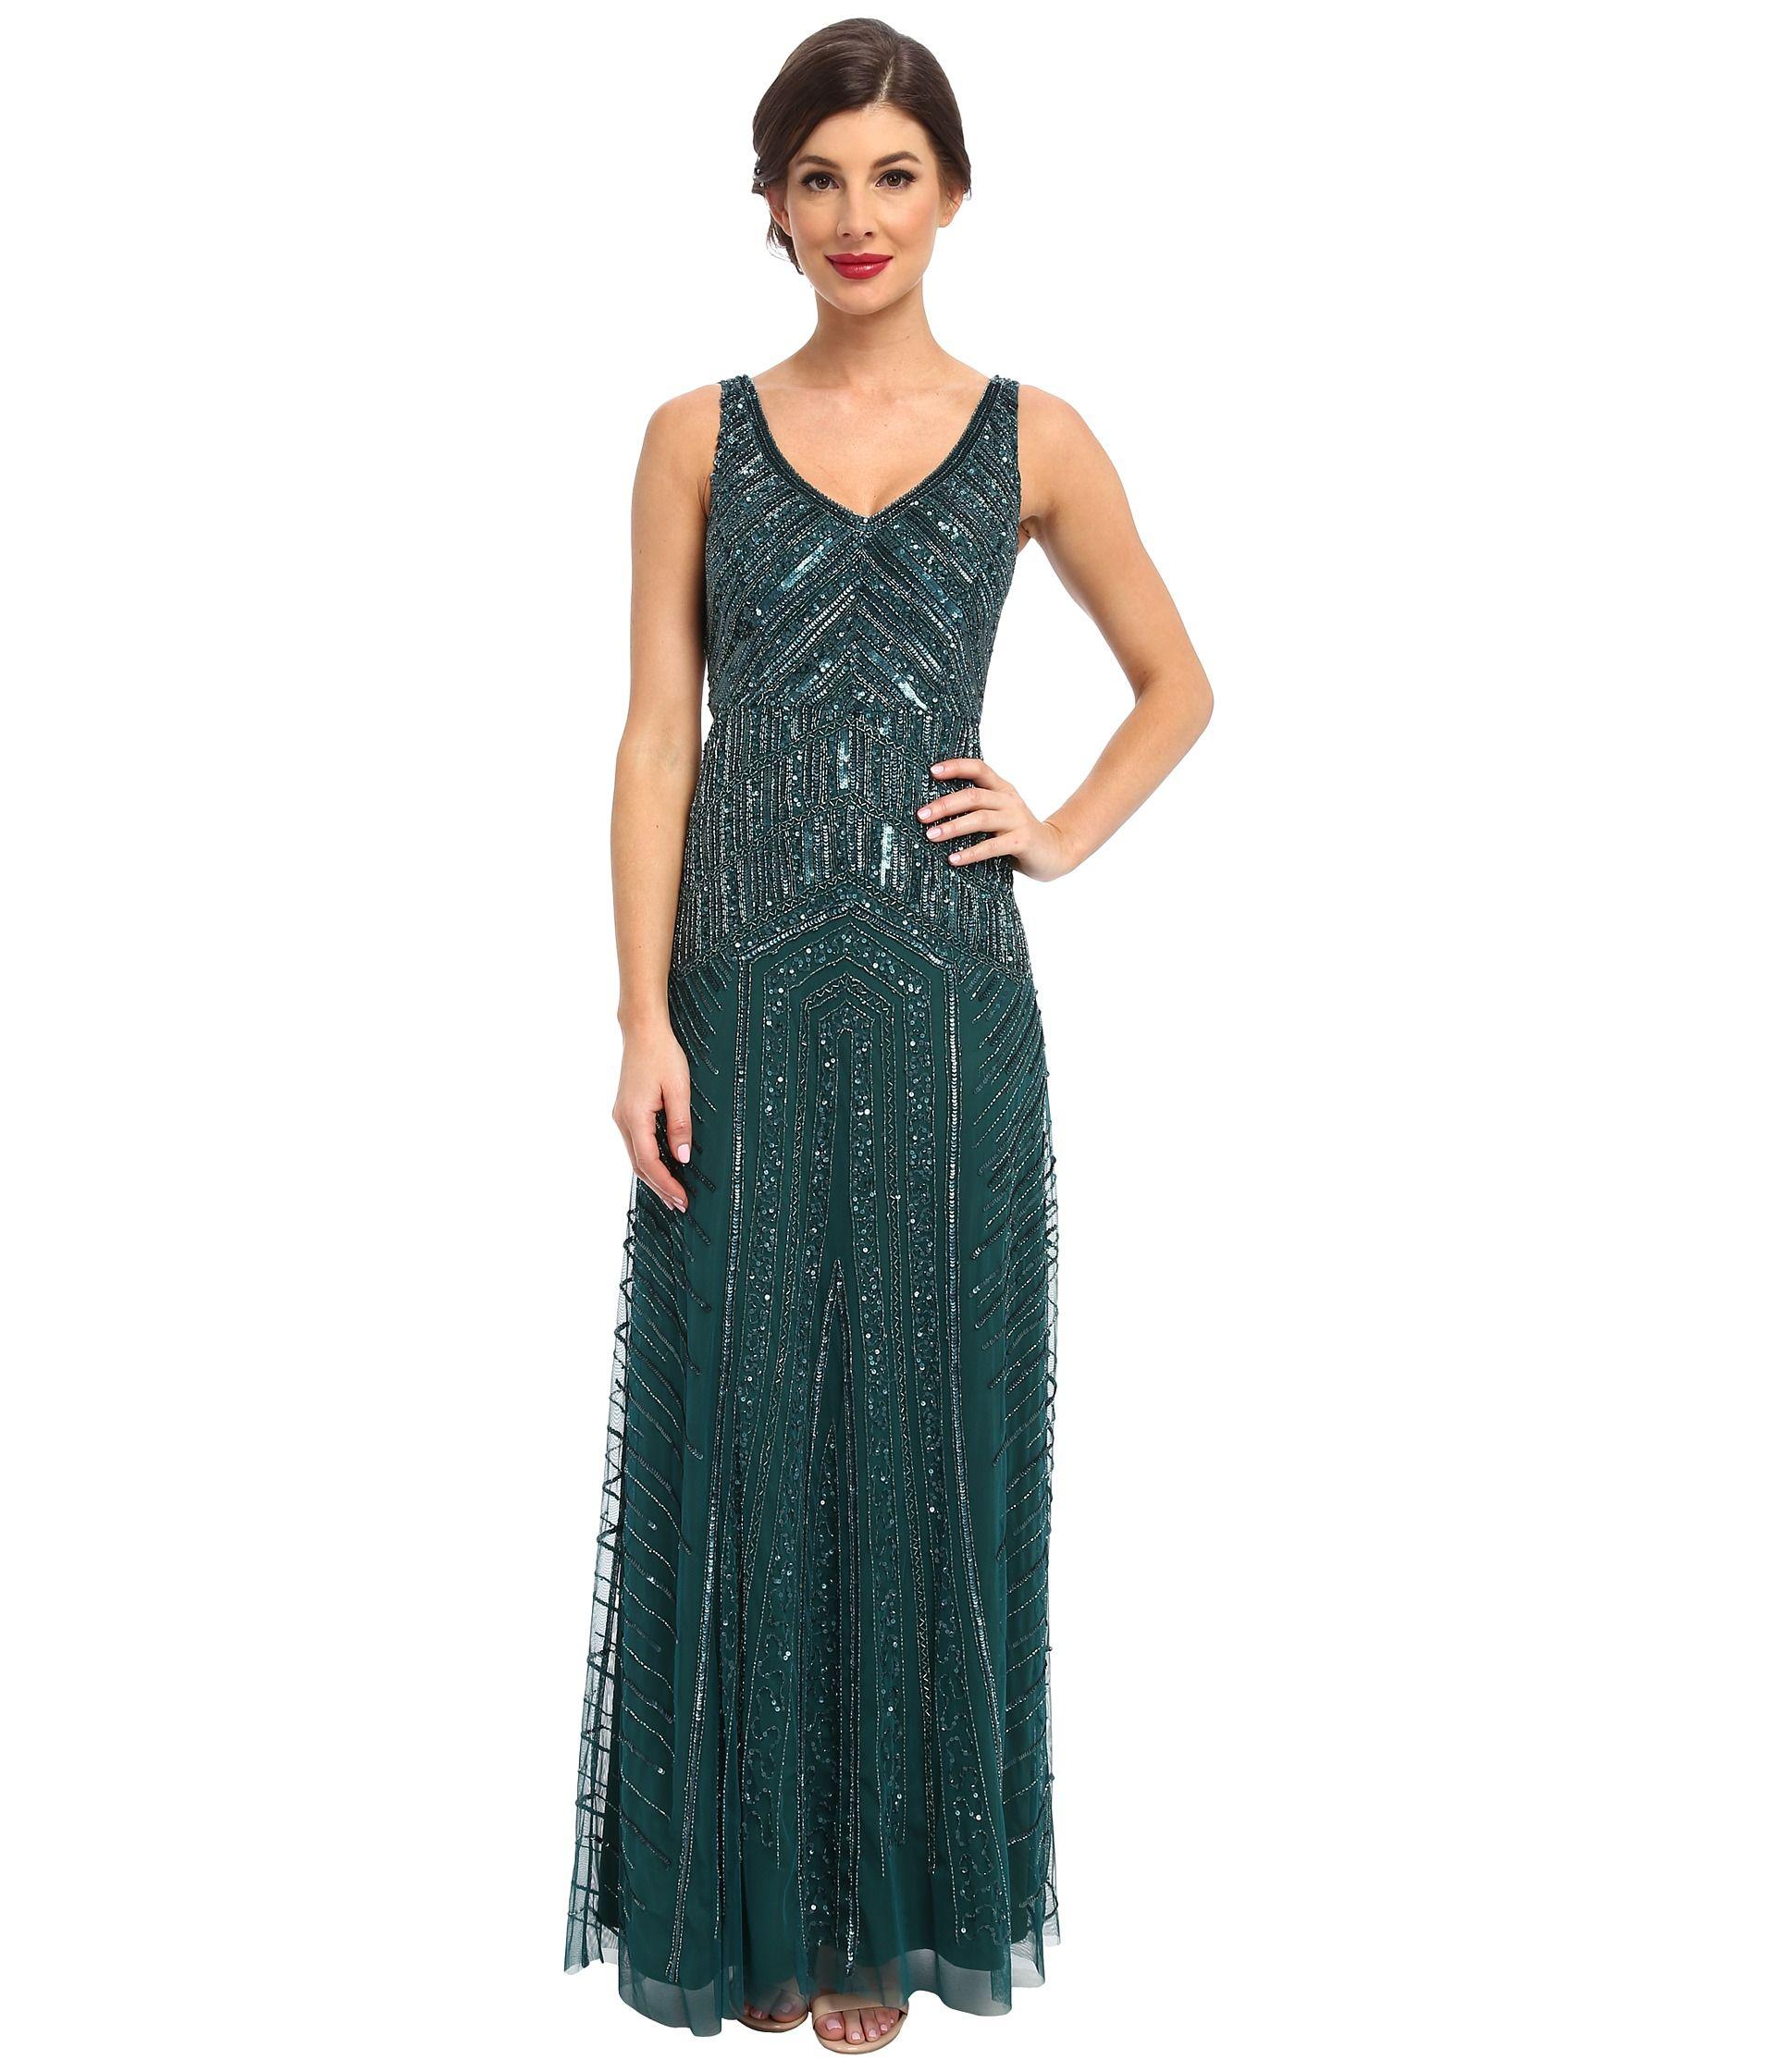 6f0e2d8ea78 Love a little sparkle for a  blacktie wedding bridesmaid dress  Adrianna  Papell